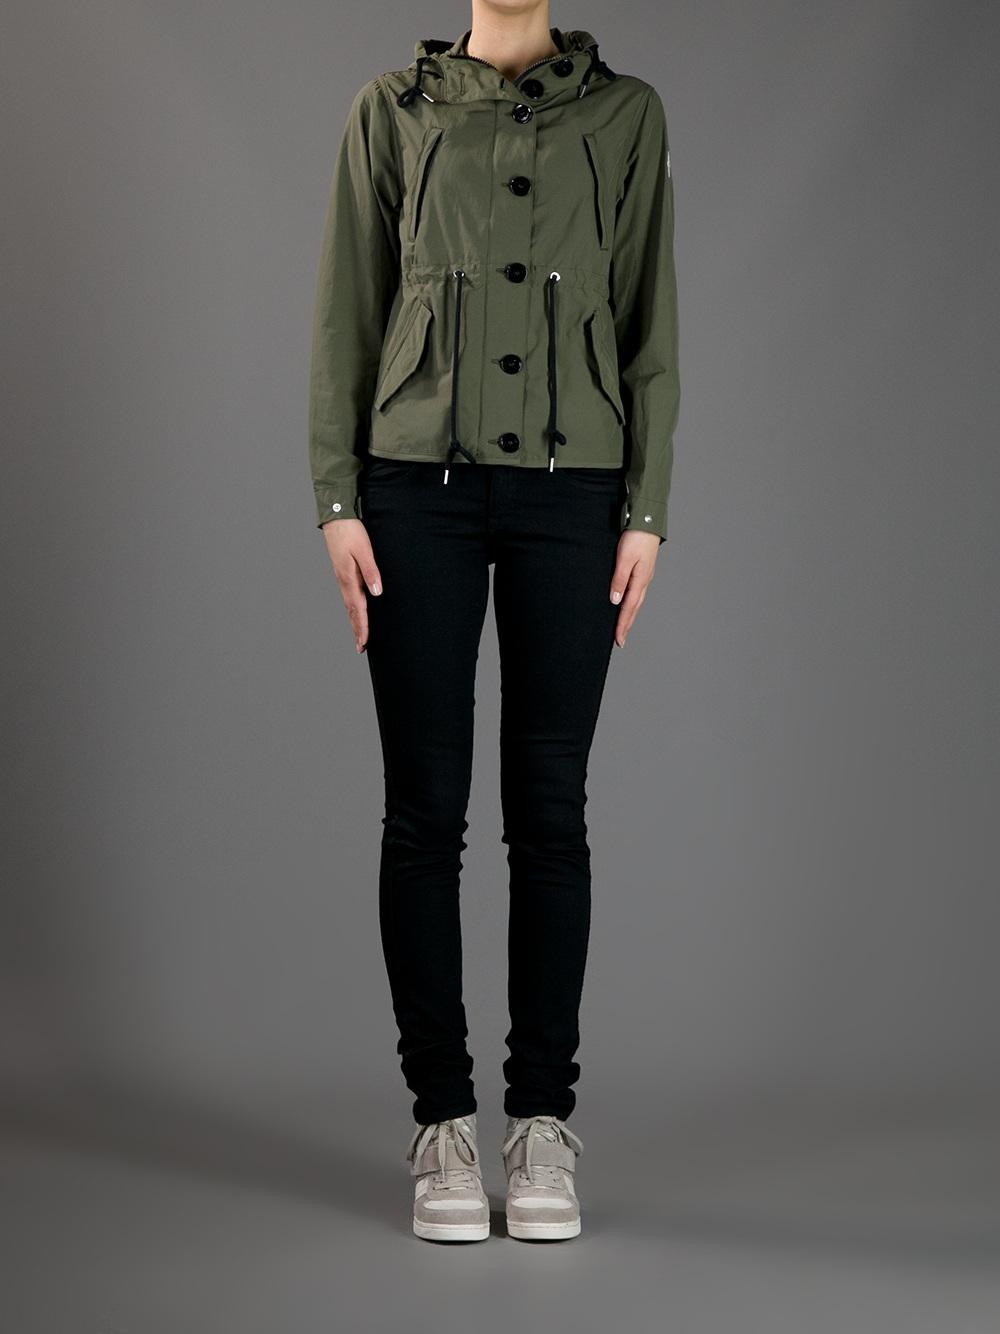 Moncler Parka Jackets